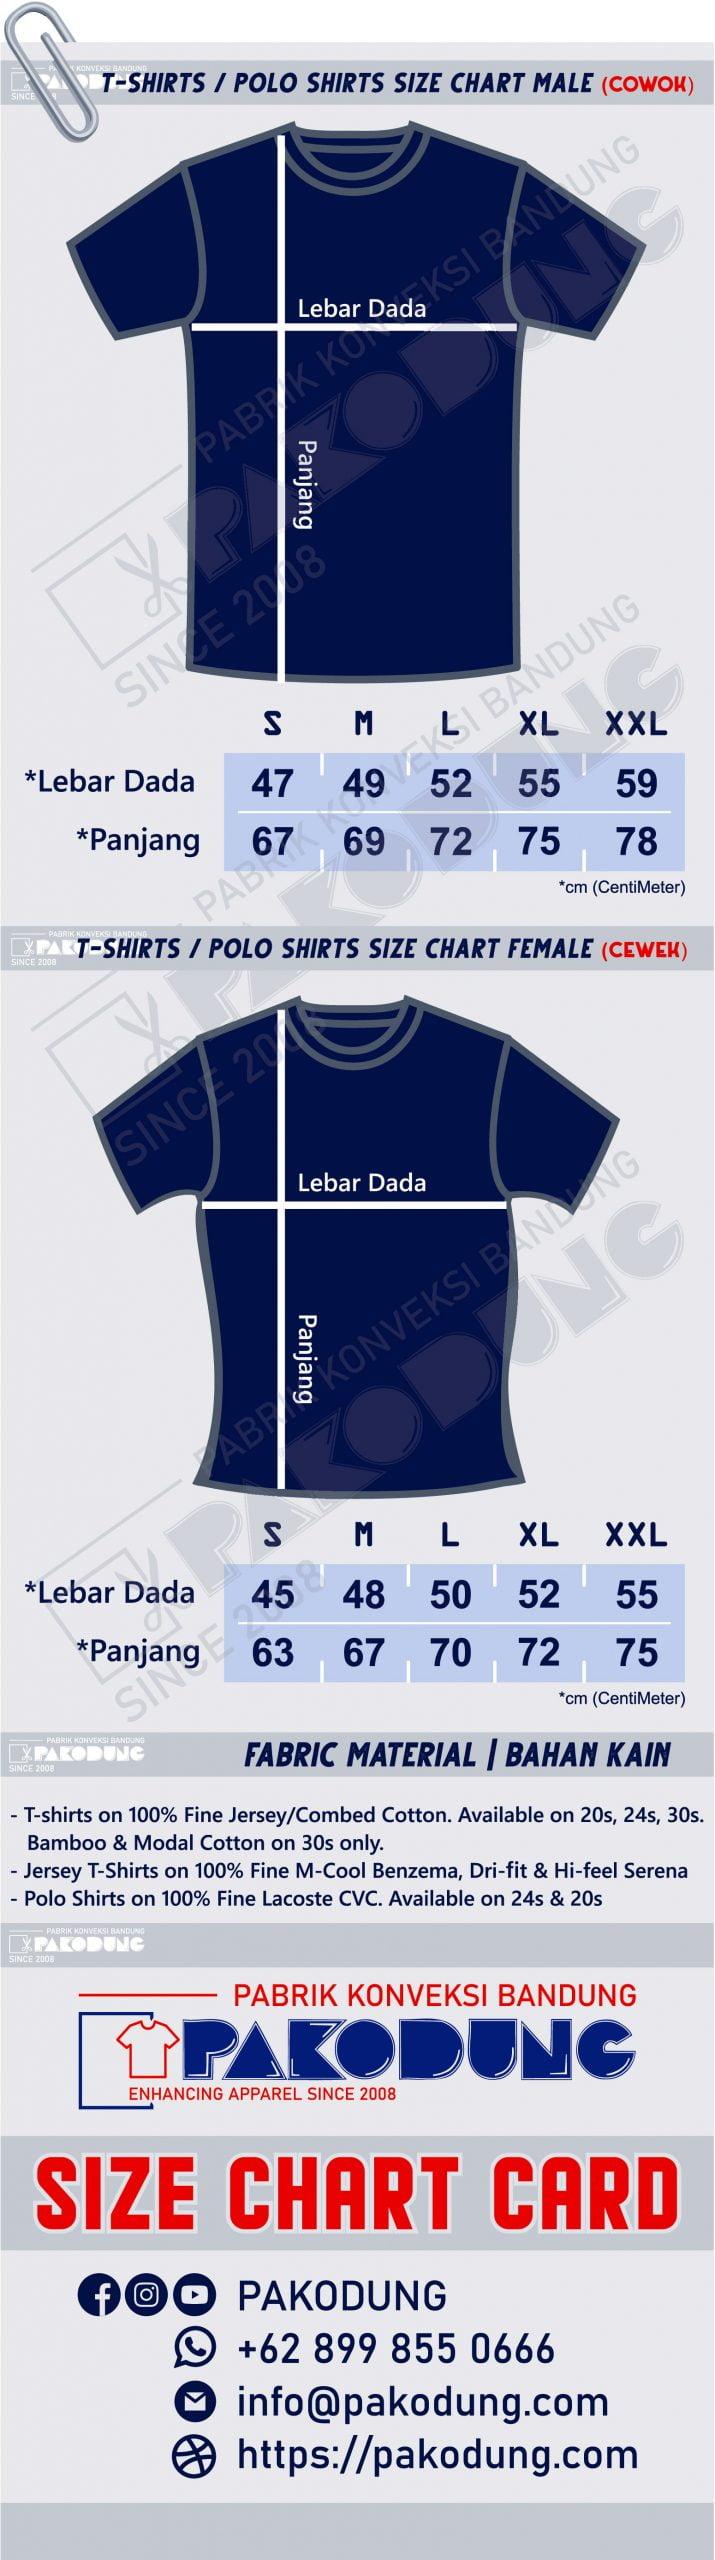 size chart kaos tshirts PABRIK KONVEKSI BANDUNG pakodung